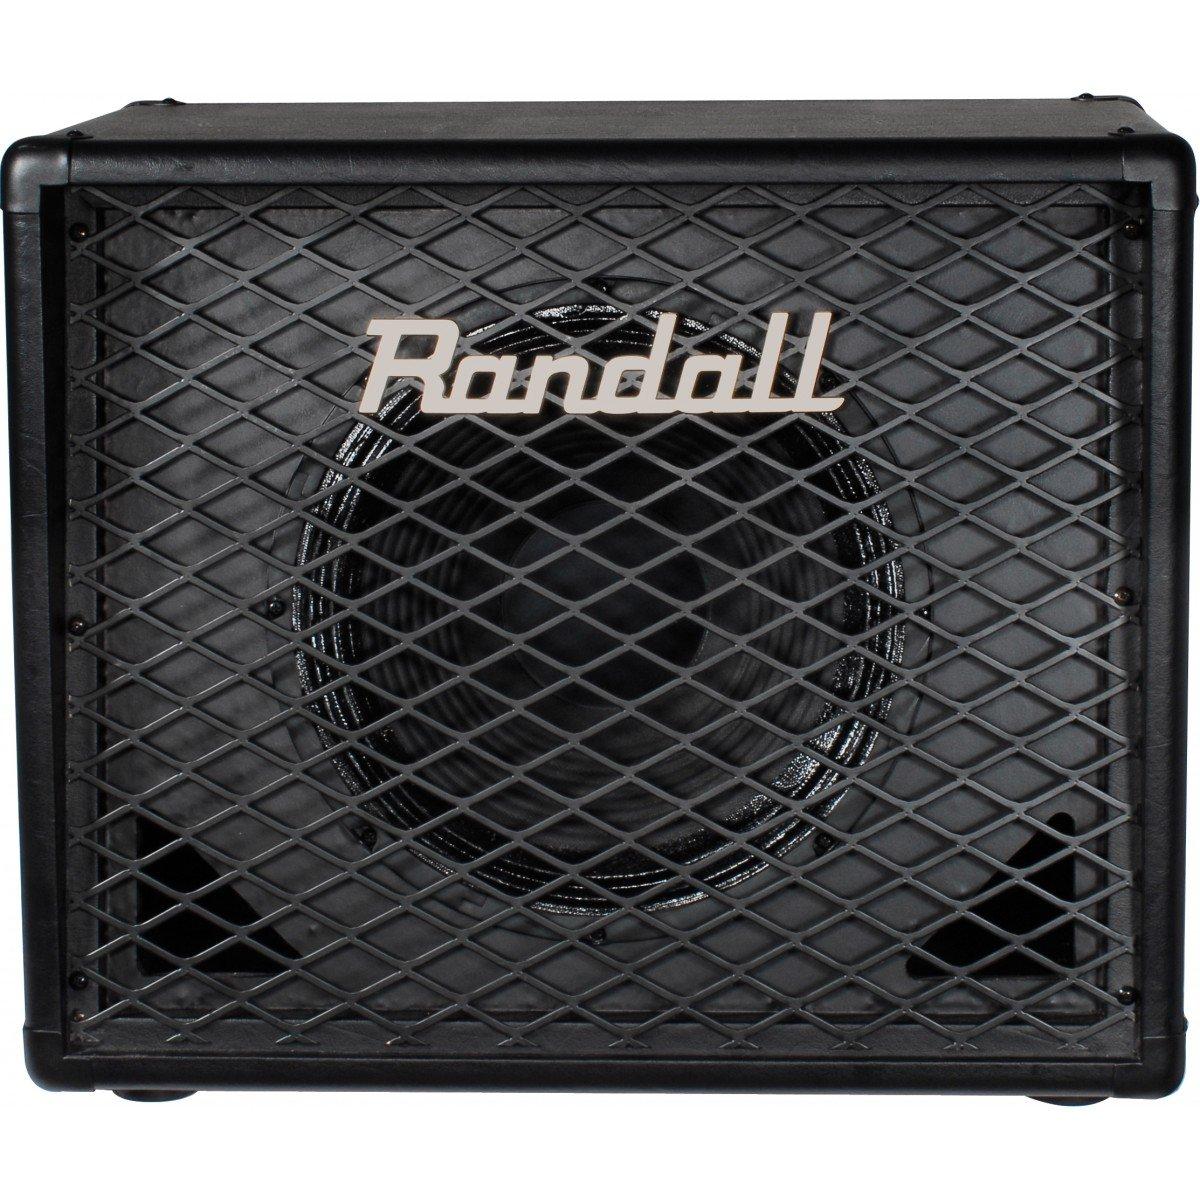 Randall RD112-V30 Diavlo Series Cabinet by Randall